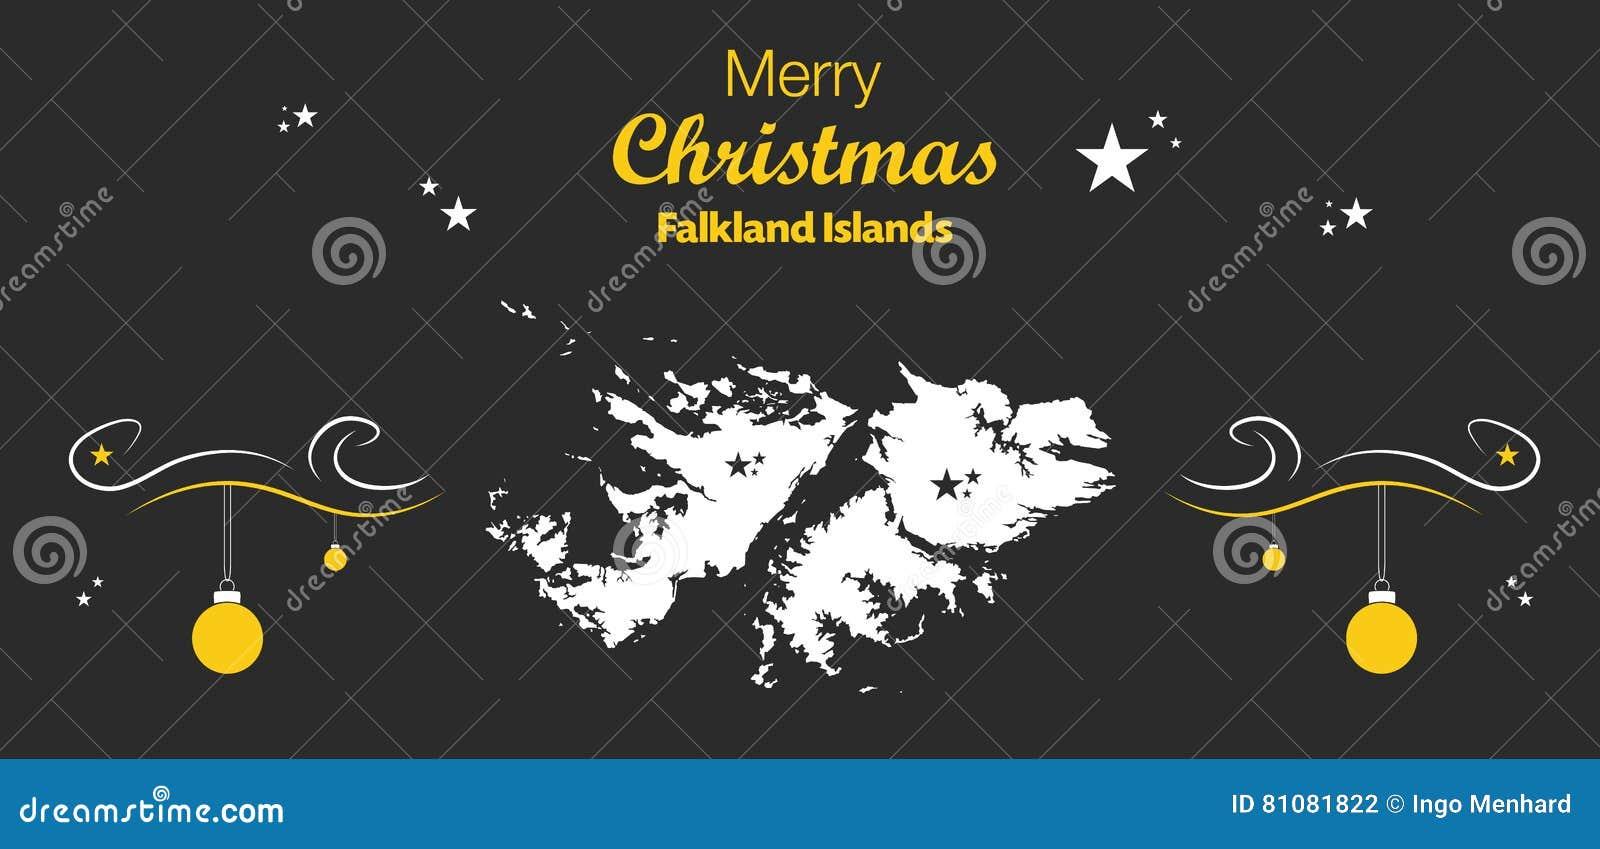 Island Christmas Theme.Merry Christmas Theme With Map Of Falkland Islands Stock